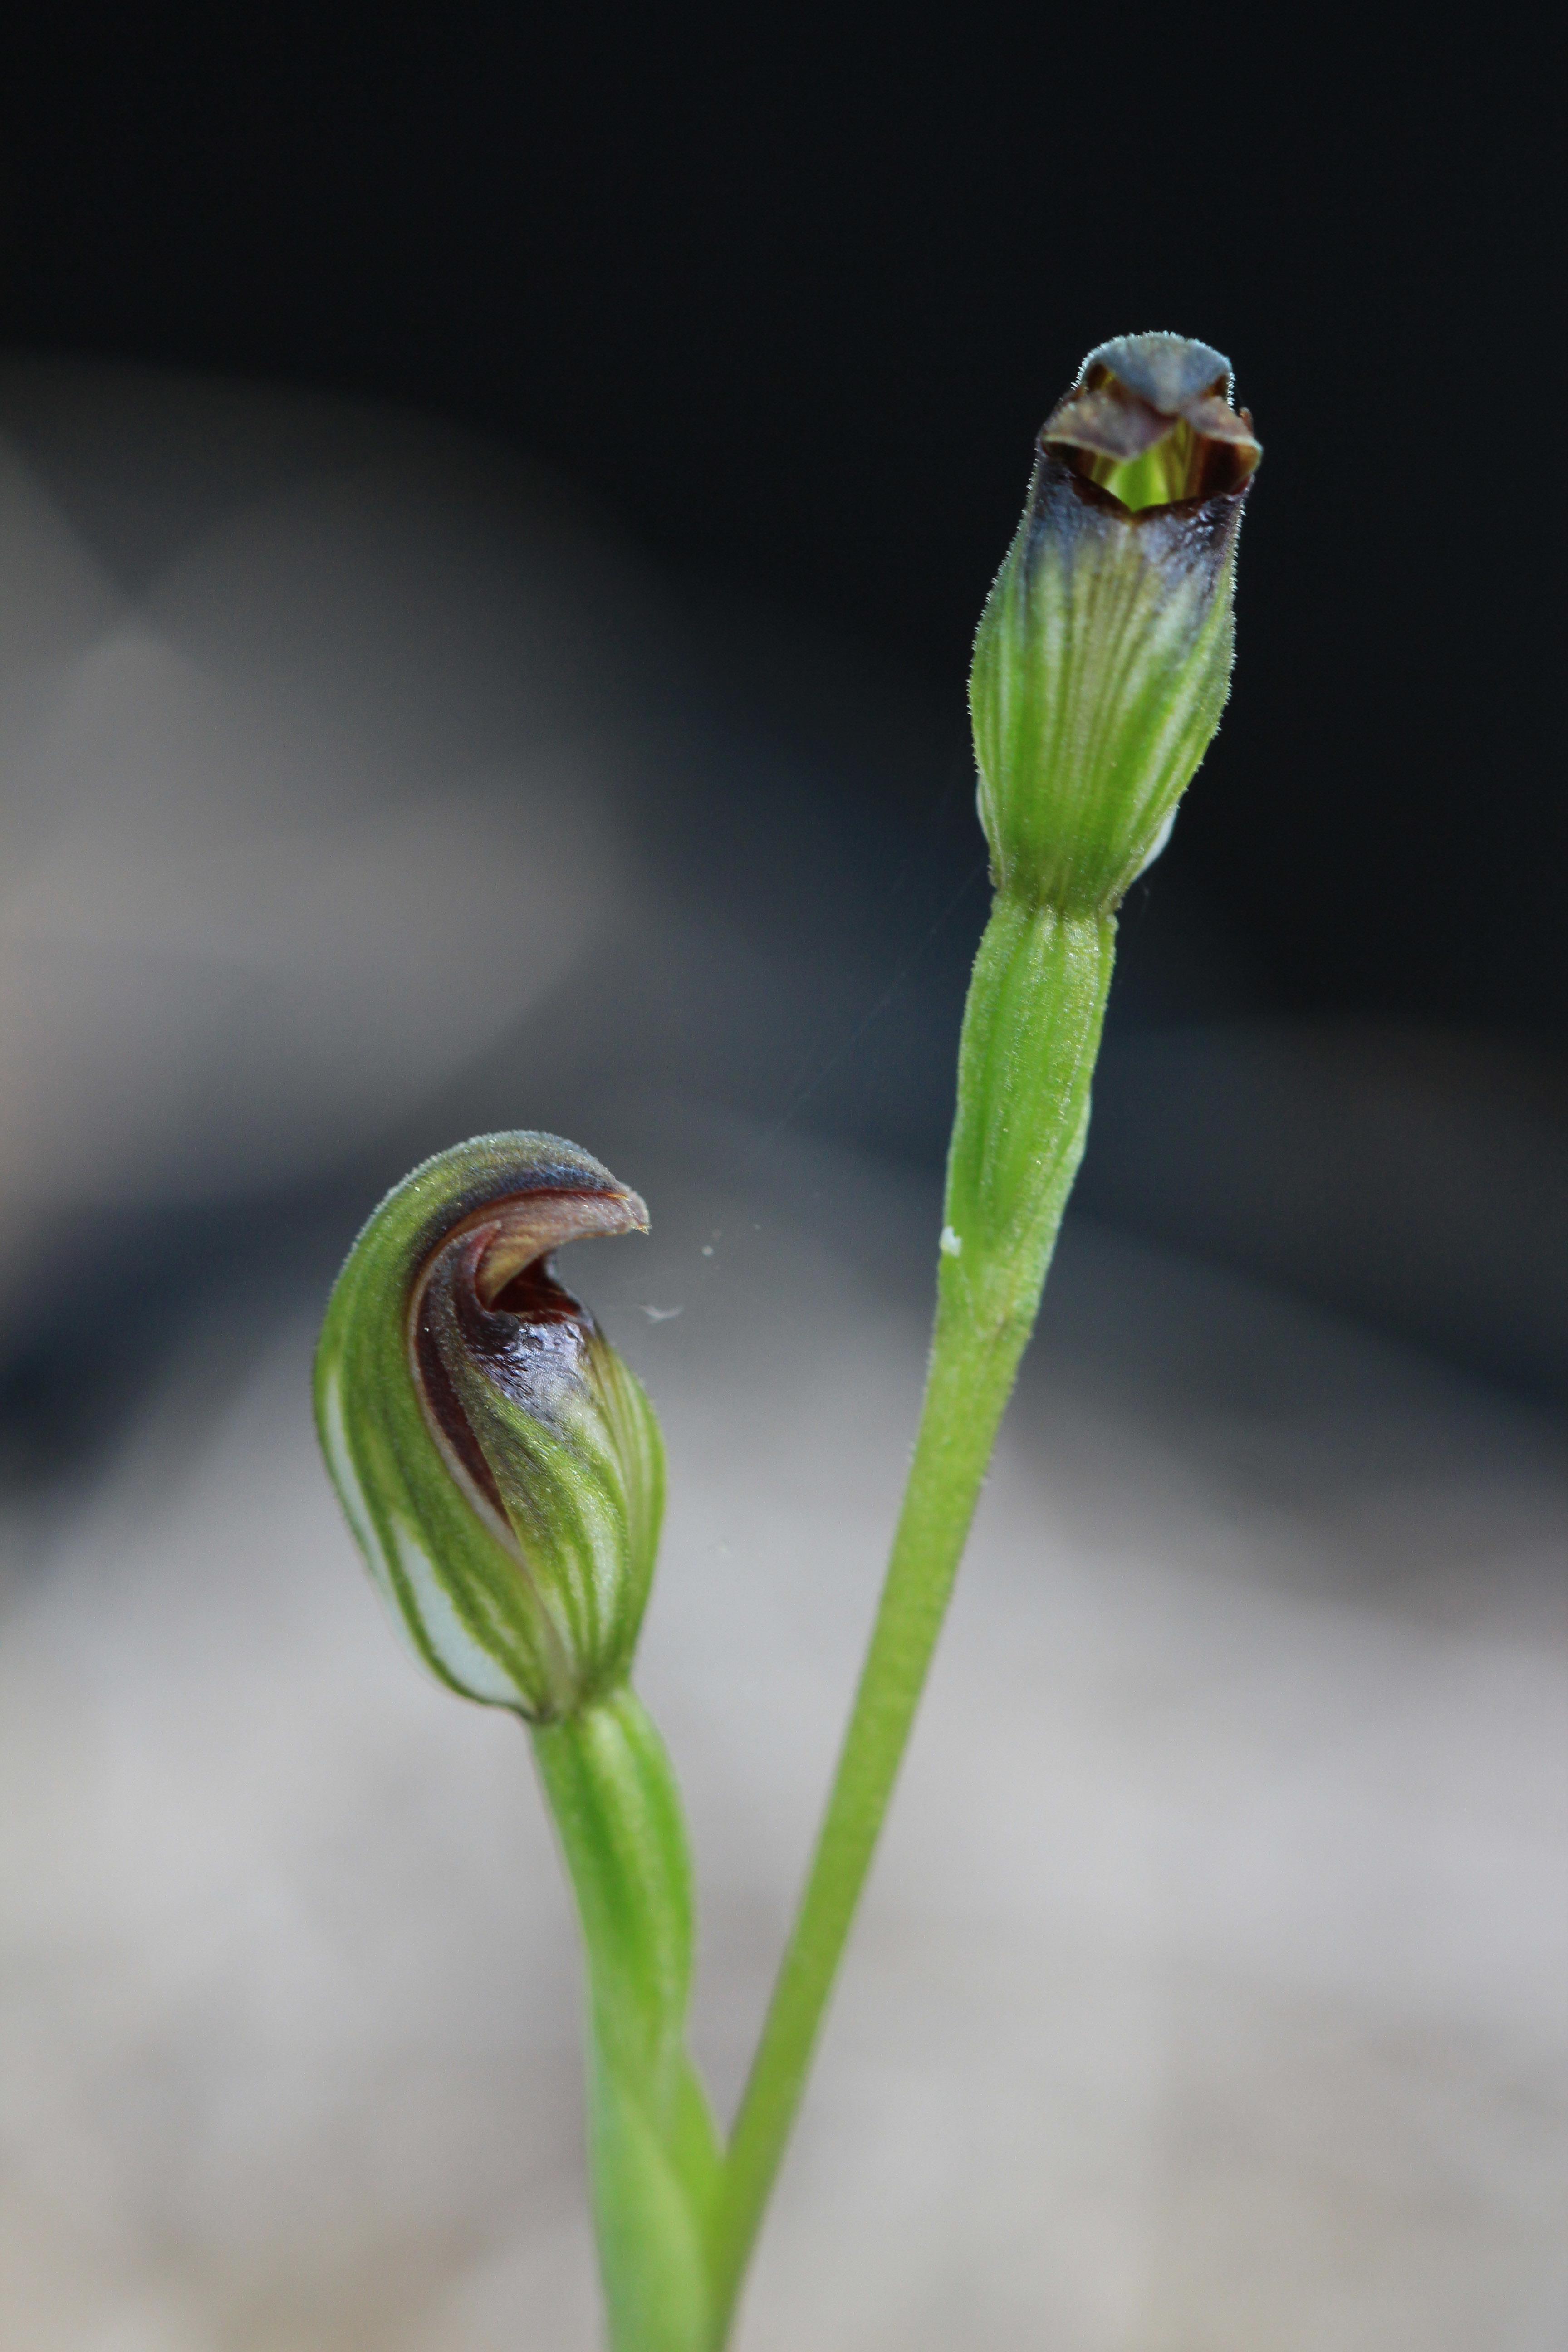 Image of Leafless greenhood